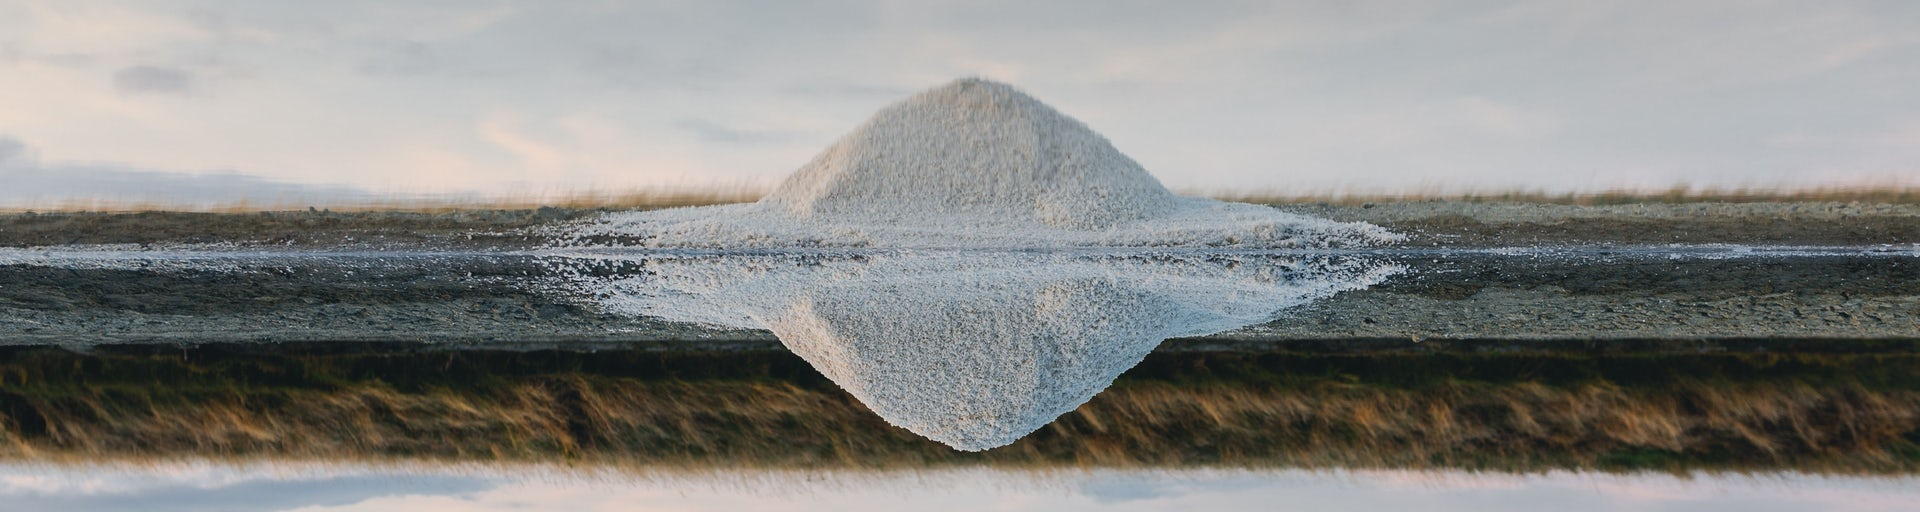 Blog zout der aarde